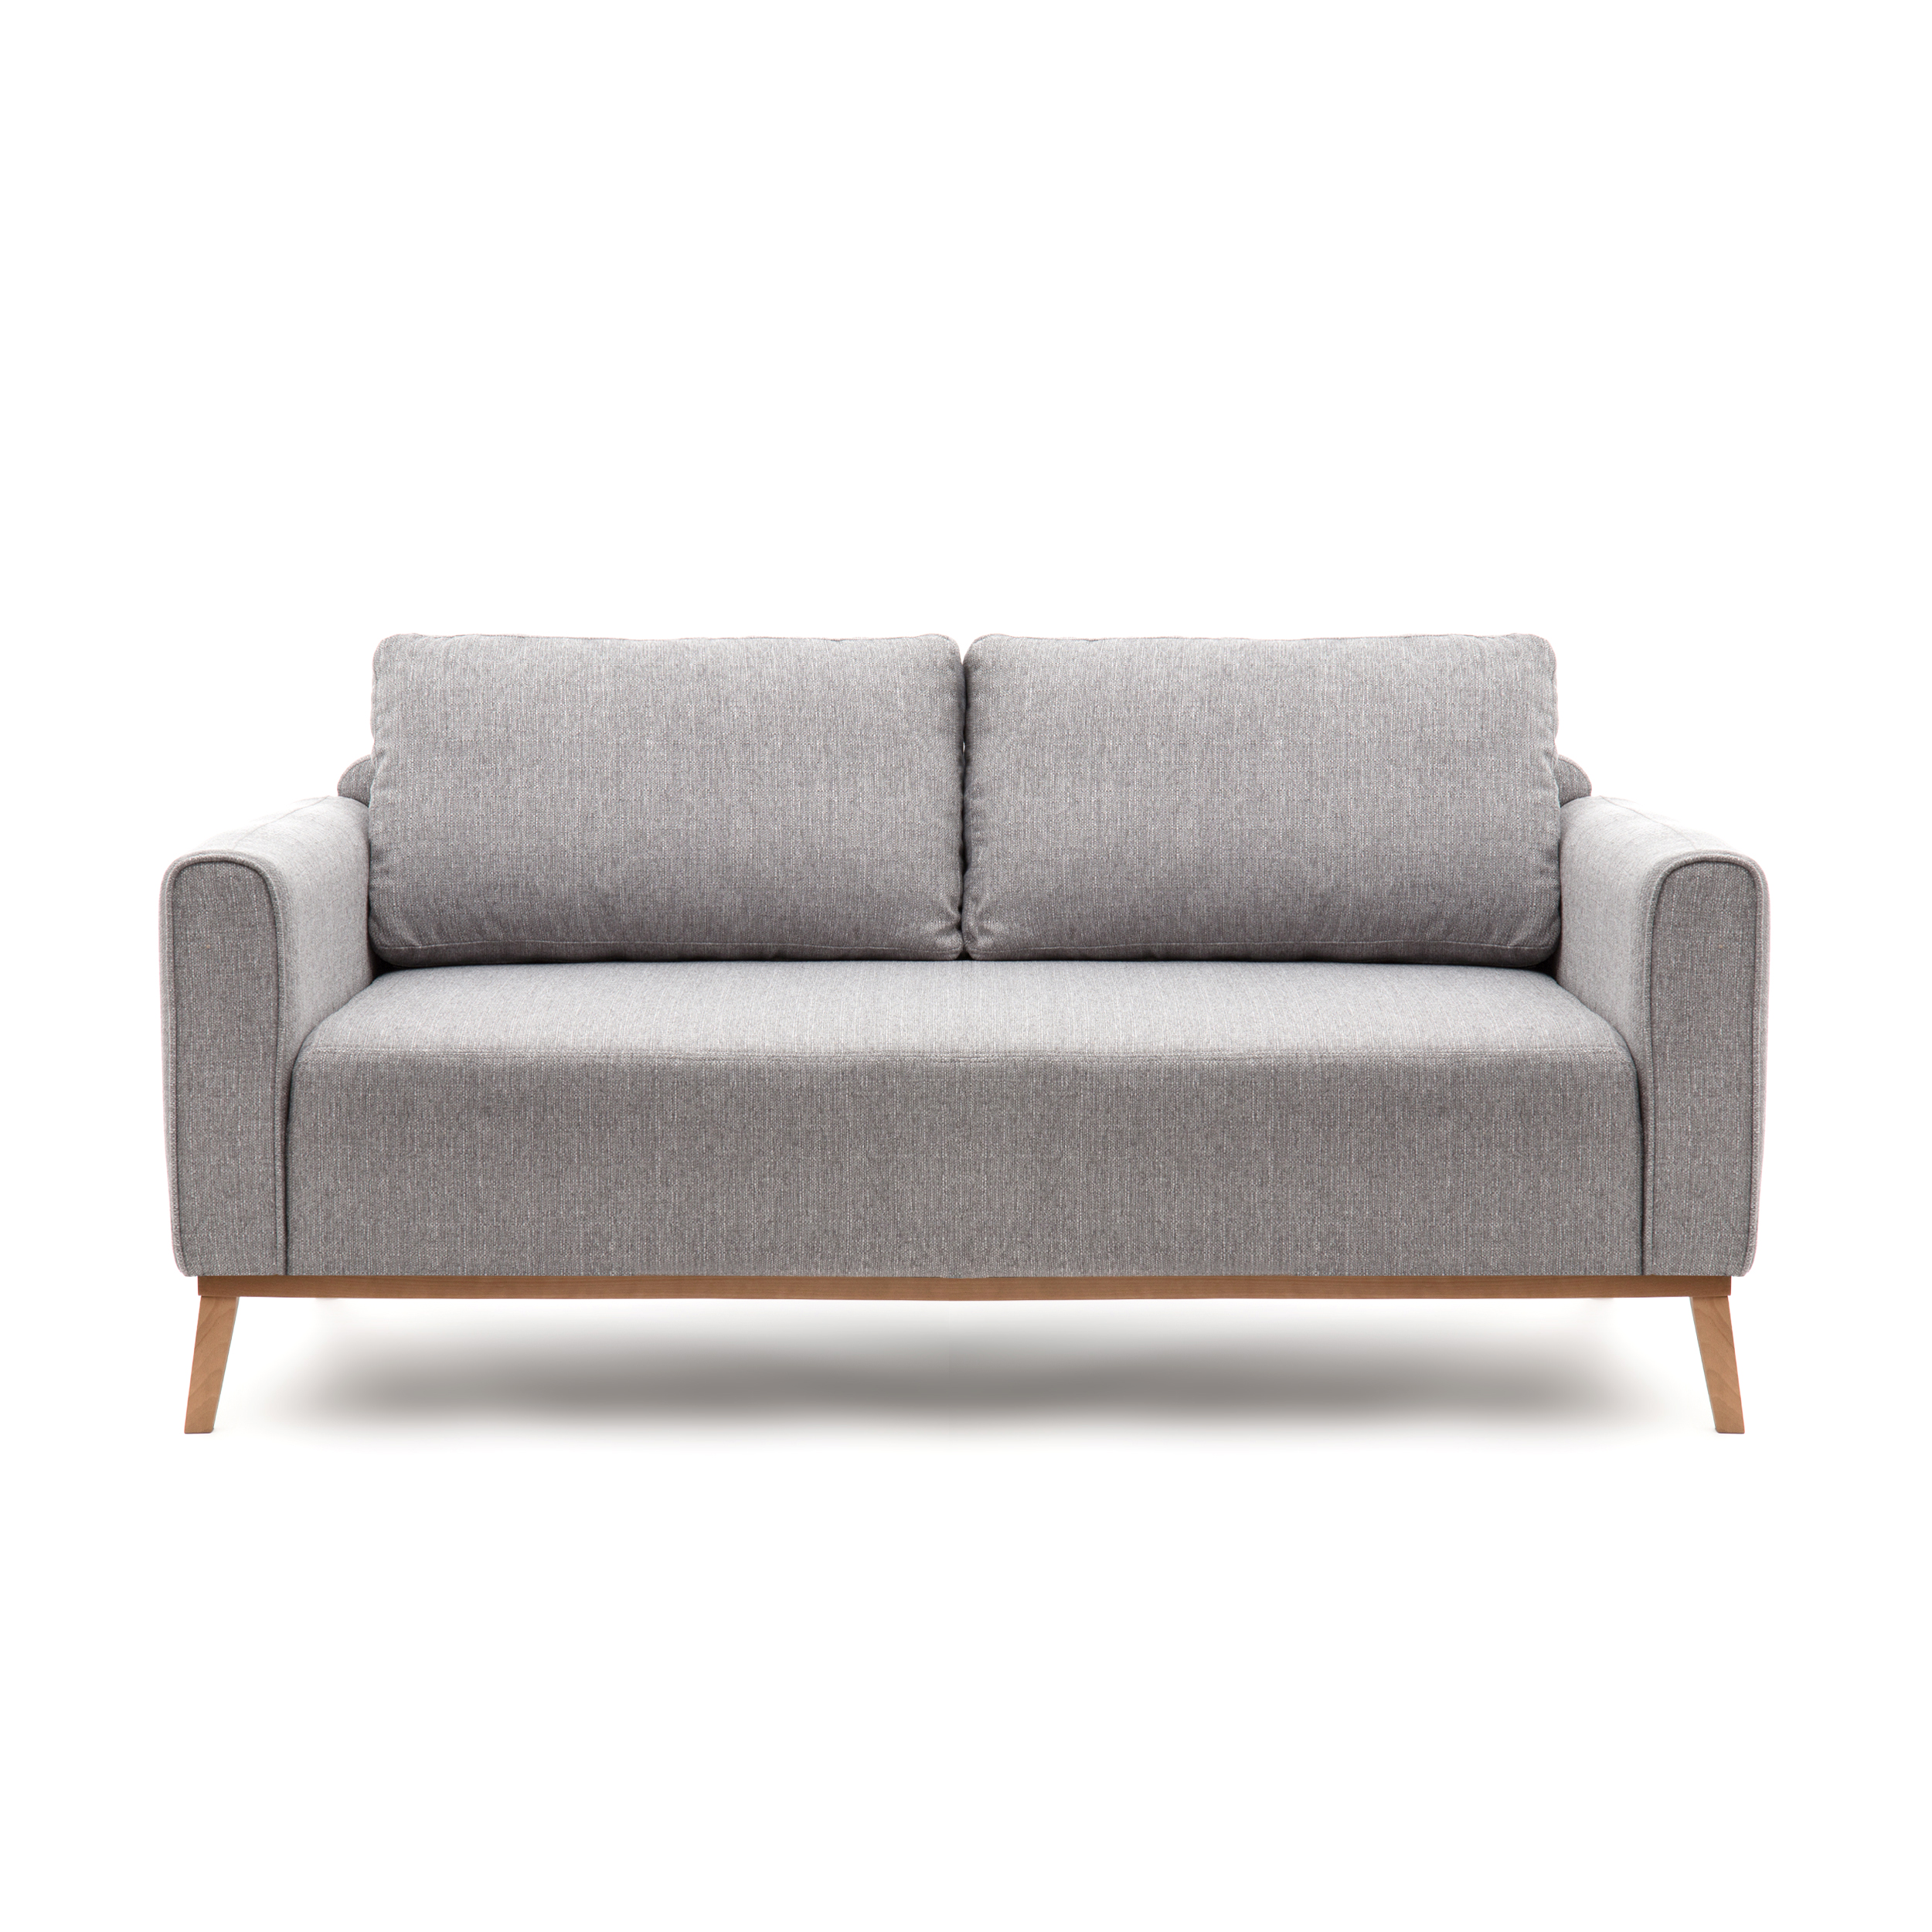 Canapea Fixa 3 locuri Milton Light Grey